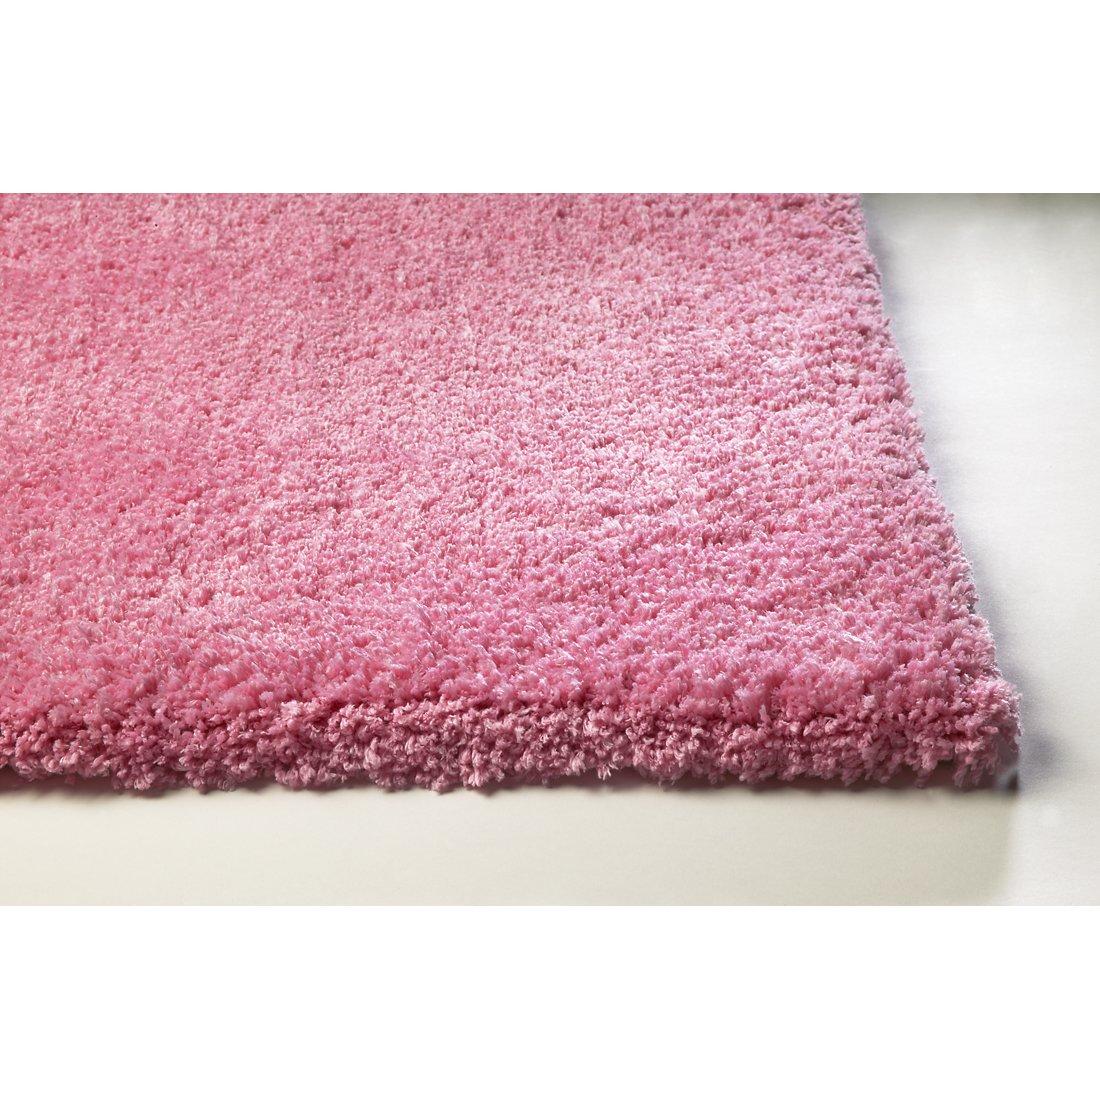 Photos of Varick Galleryu0026reg; Bouvier Hot Pink Area Rug hot pink area rug